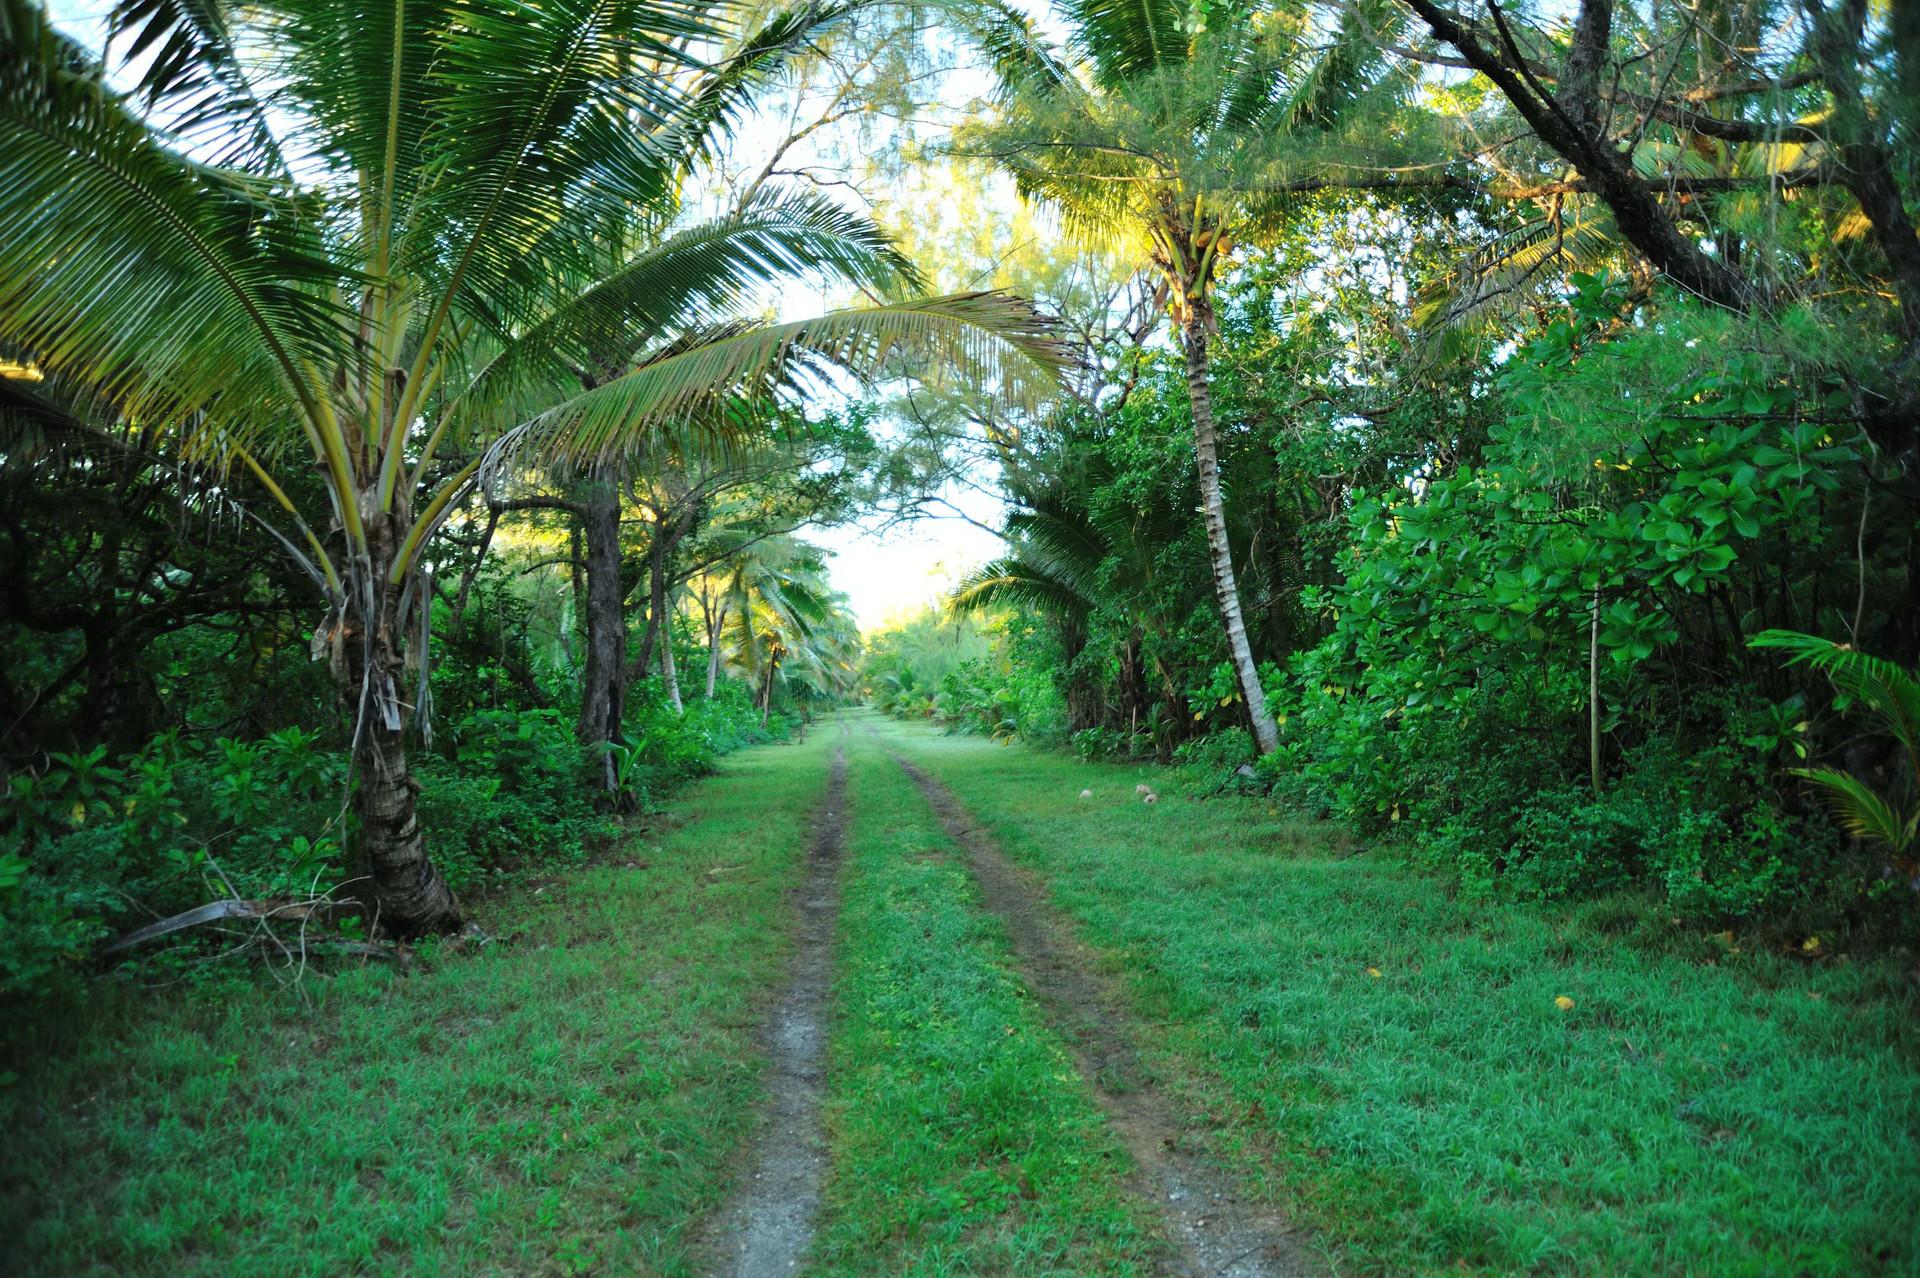 The road around the island